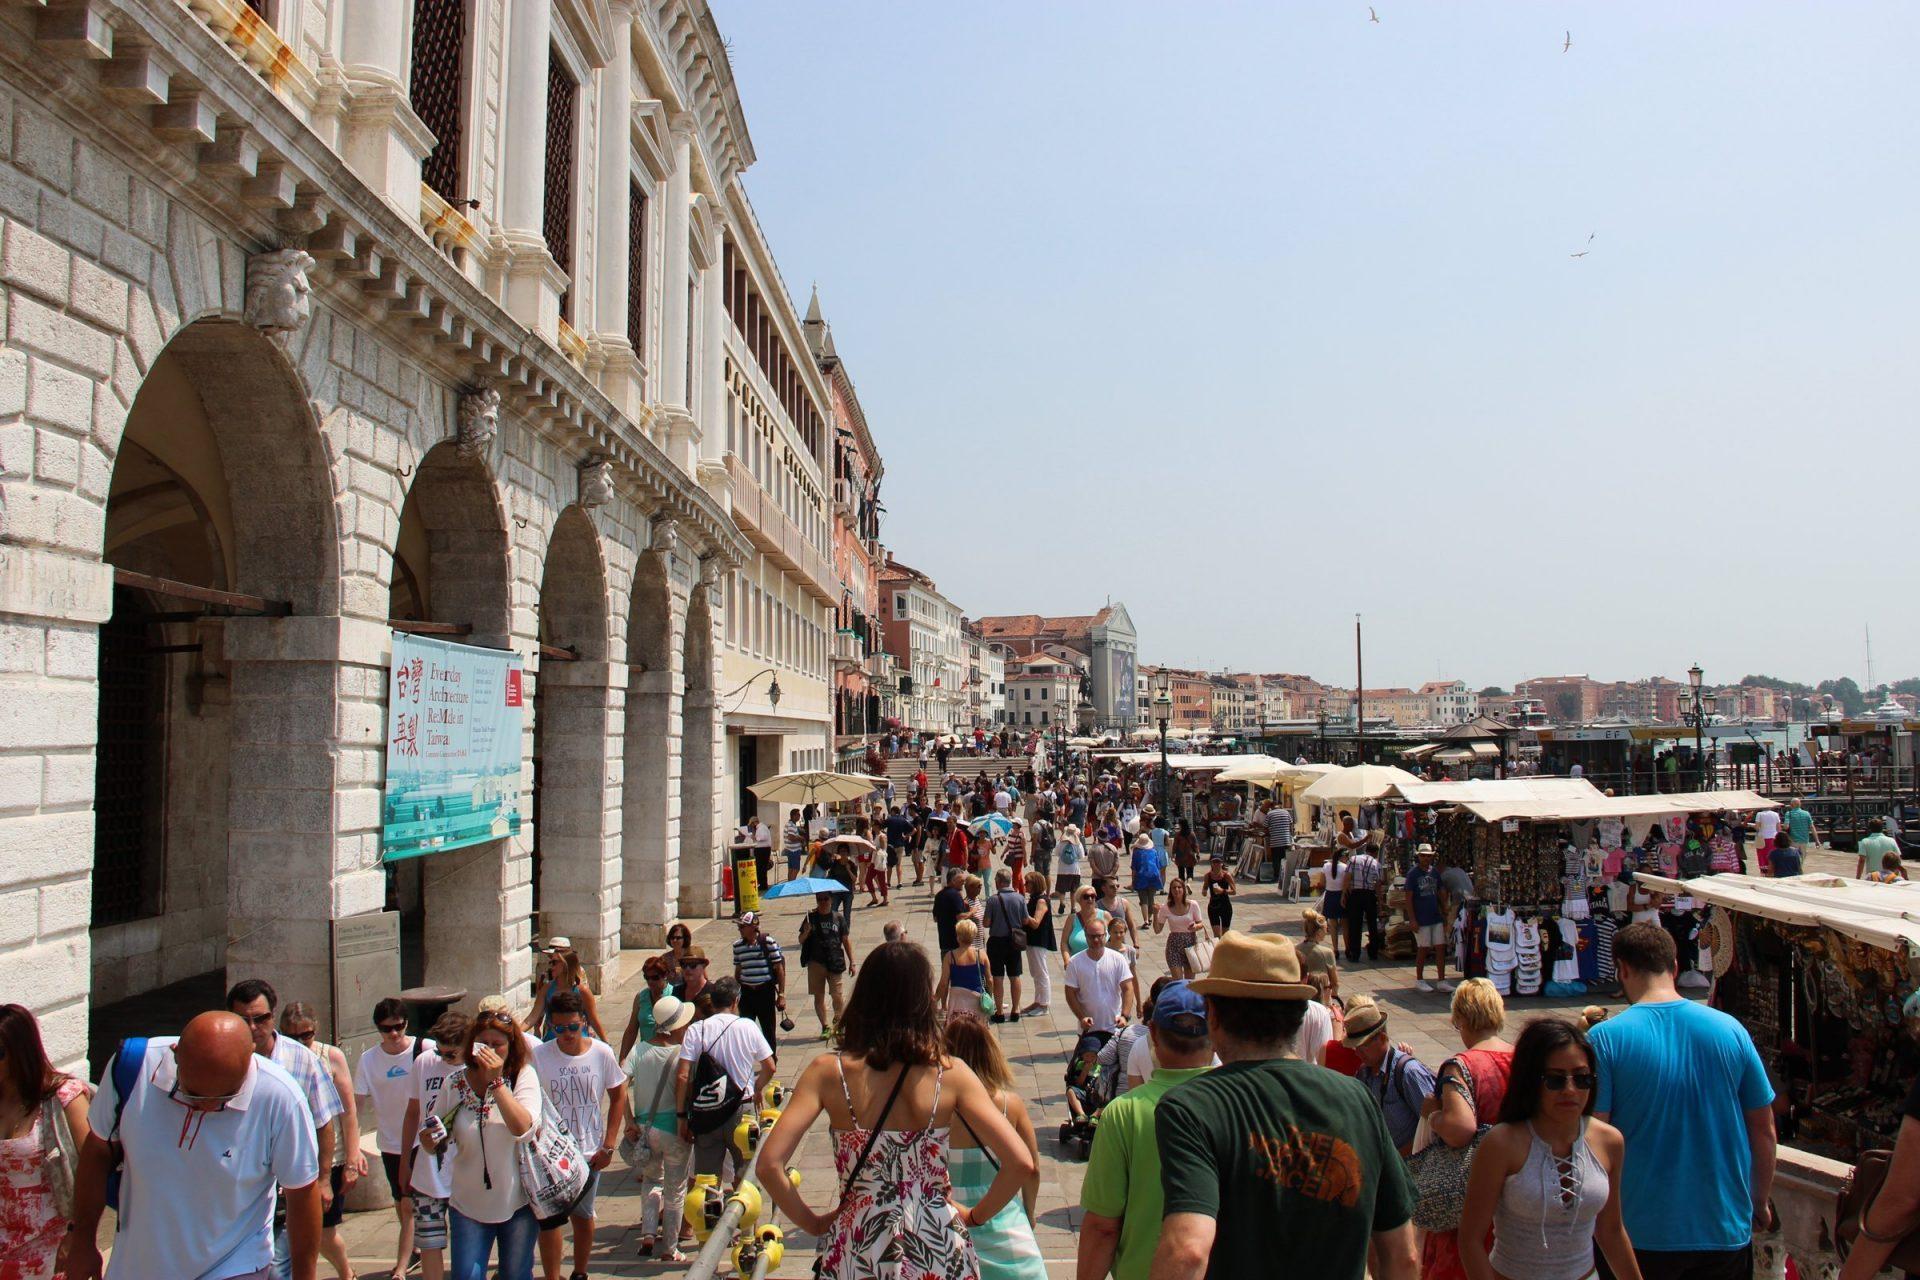 Crowds Of Tourists Near Arcade